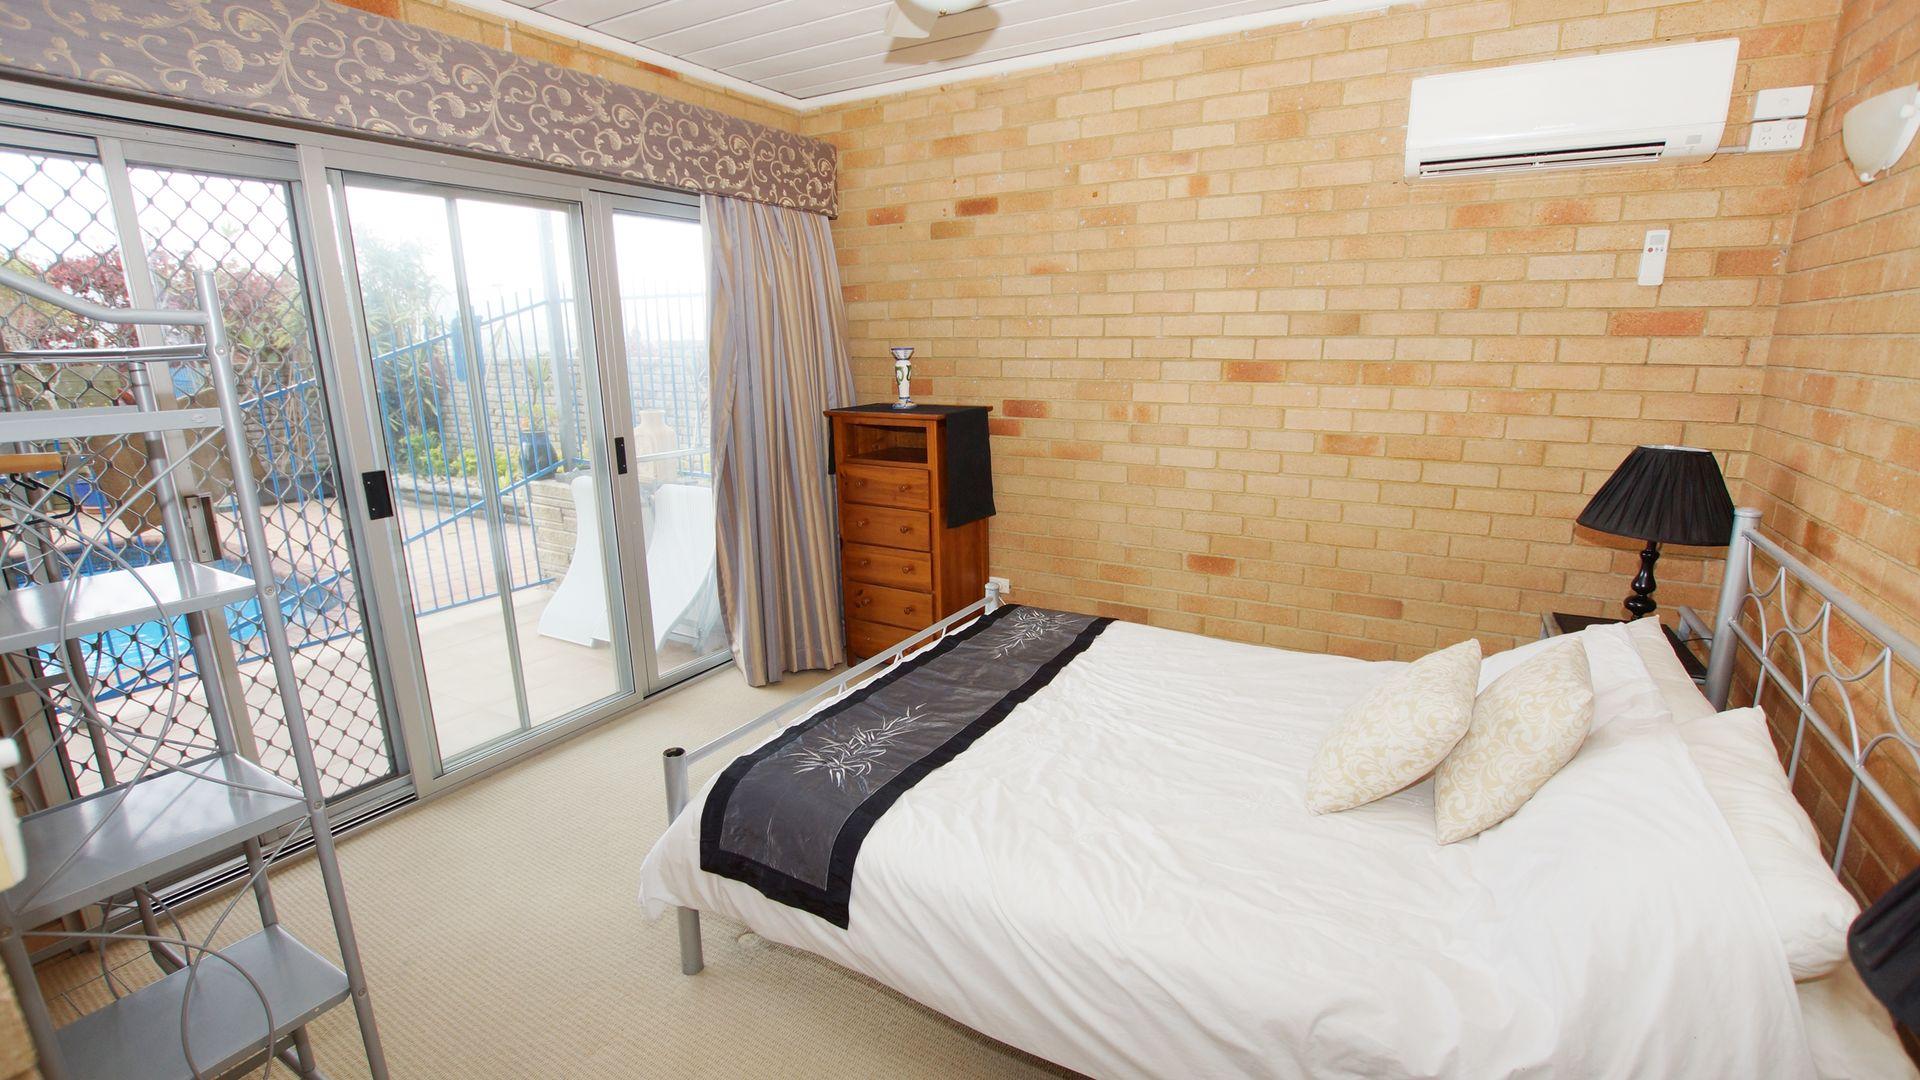 Coffs Harbour NSW 2450, Image 1